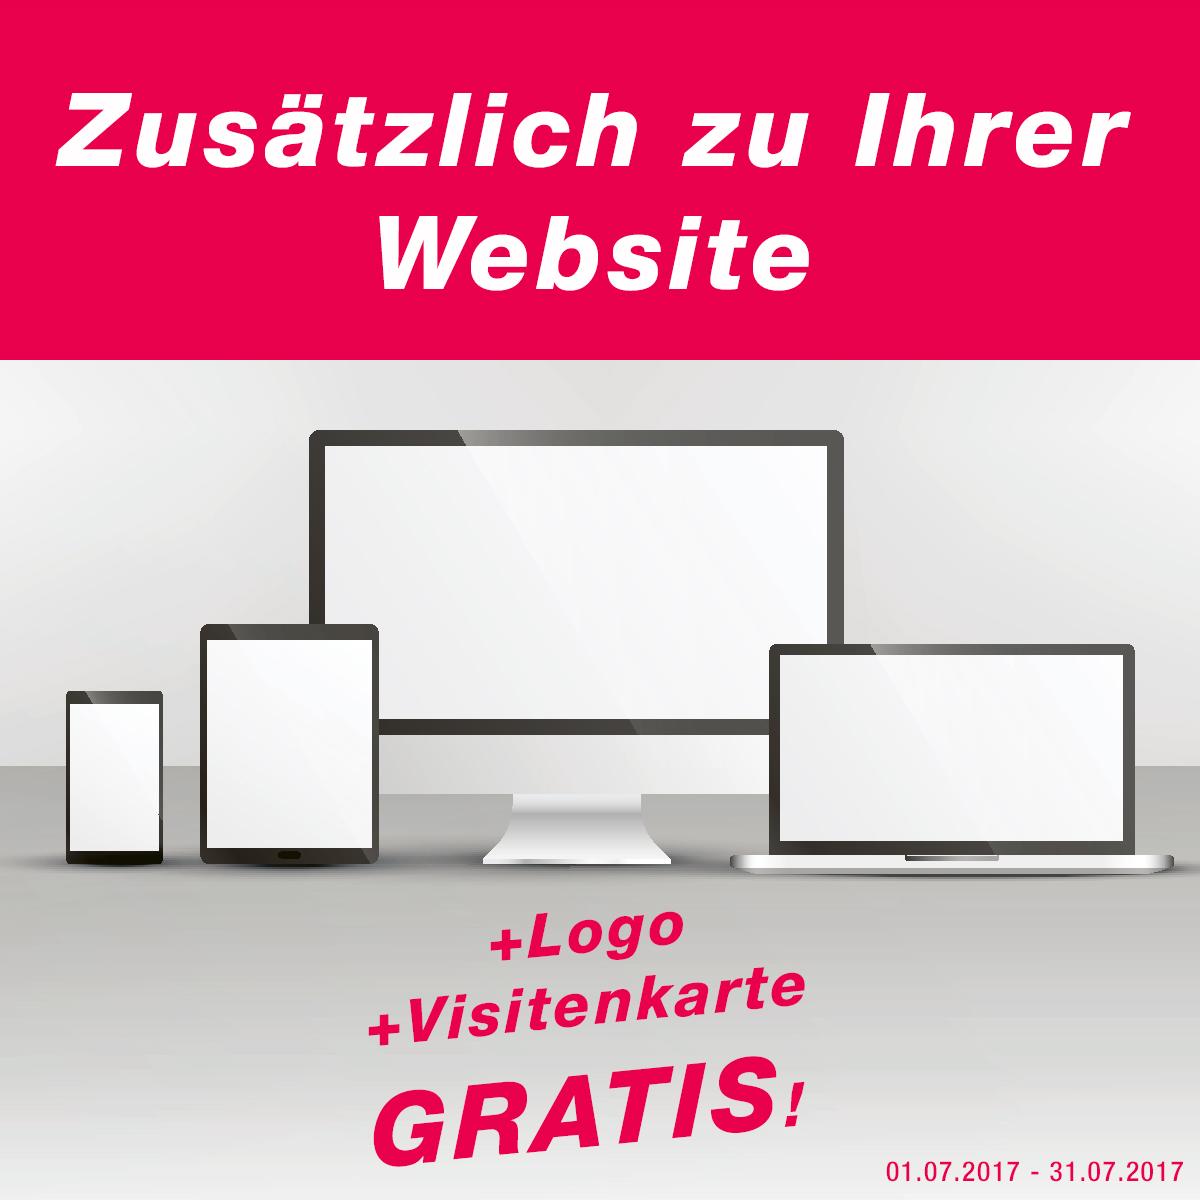 Gratis Logo, gratis Vistitenkarten